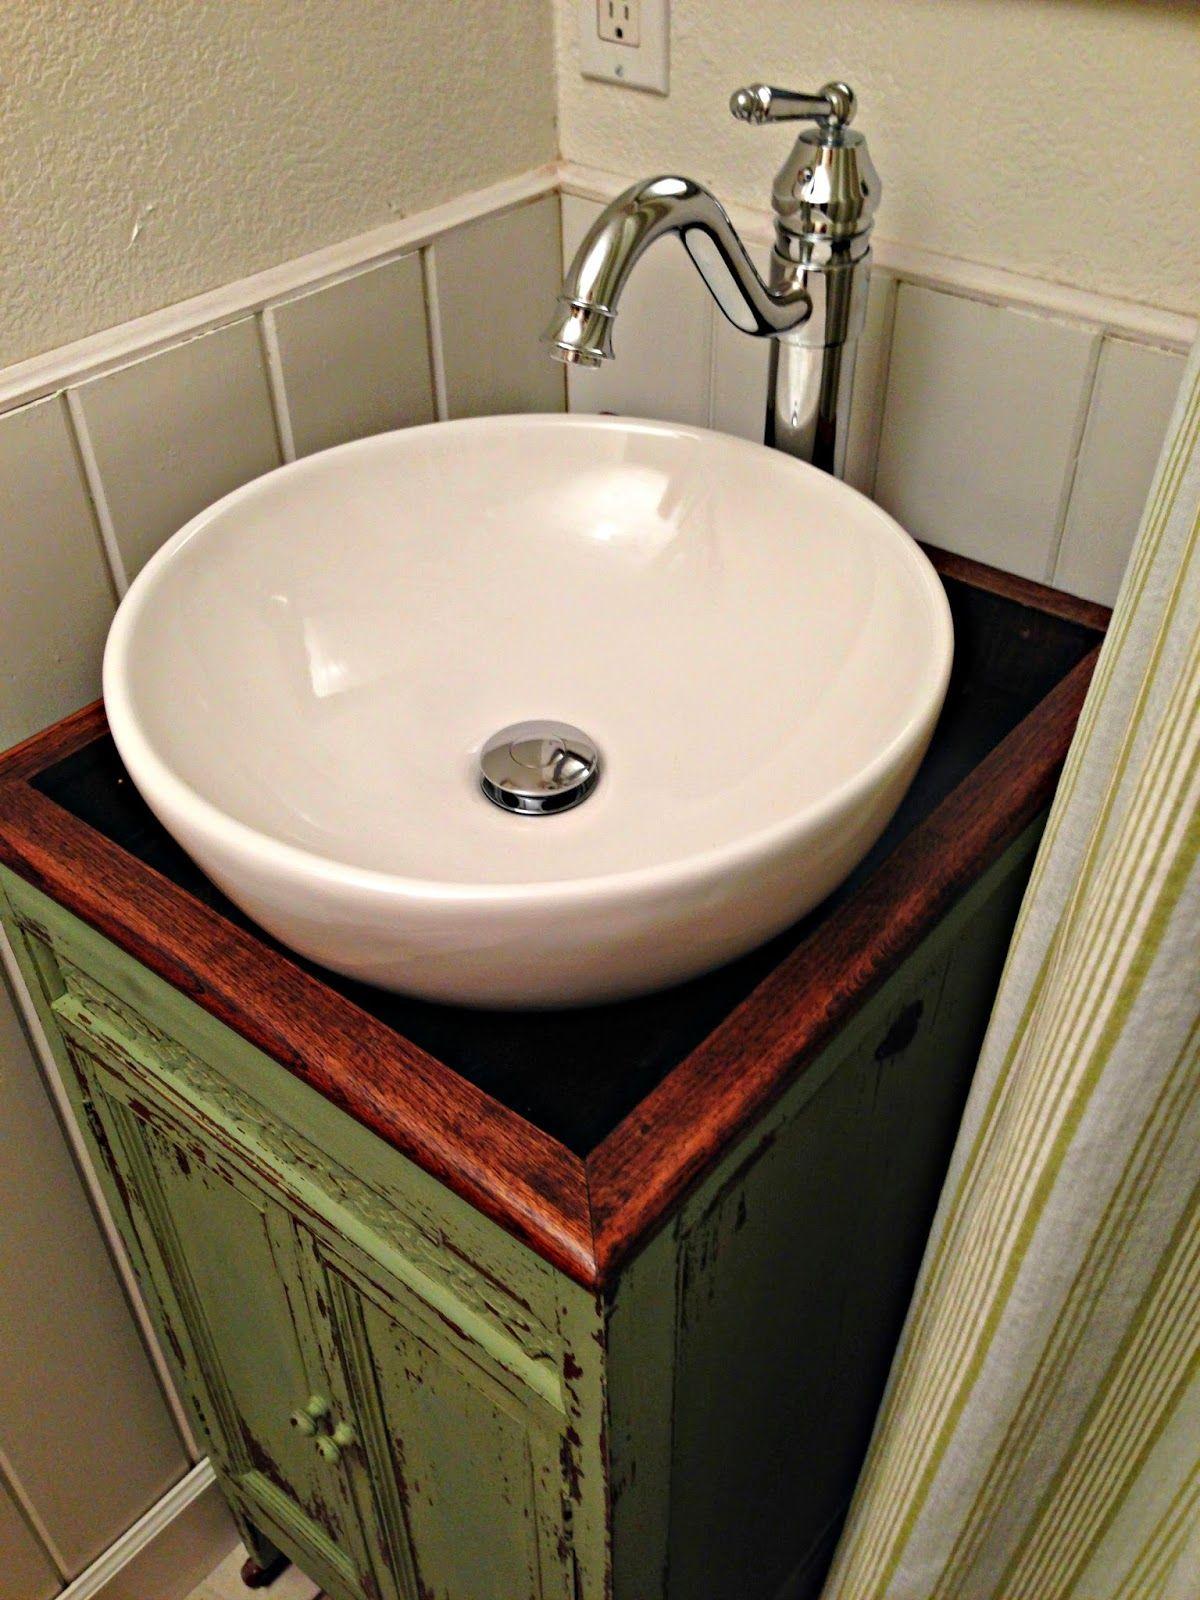 Make Your Own Vessel Sink - Sink Ideas